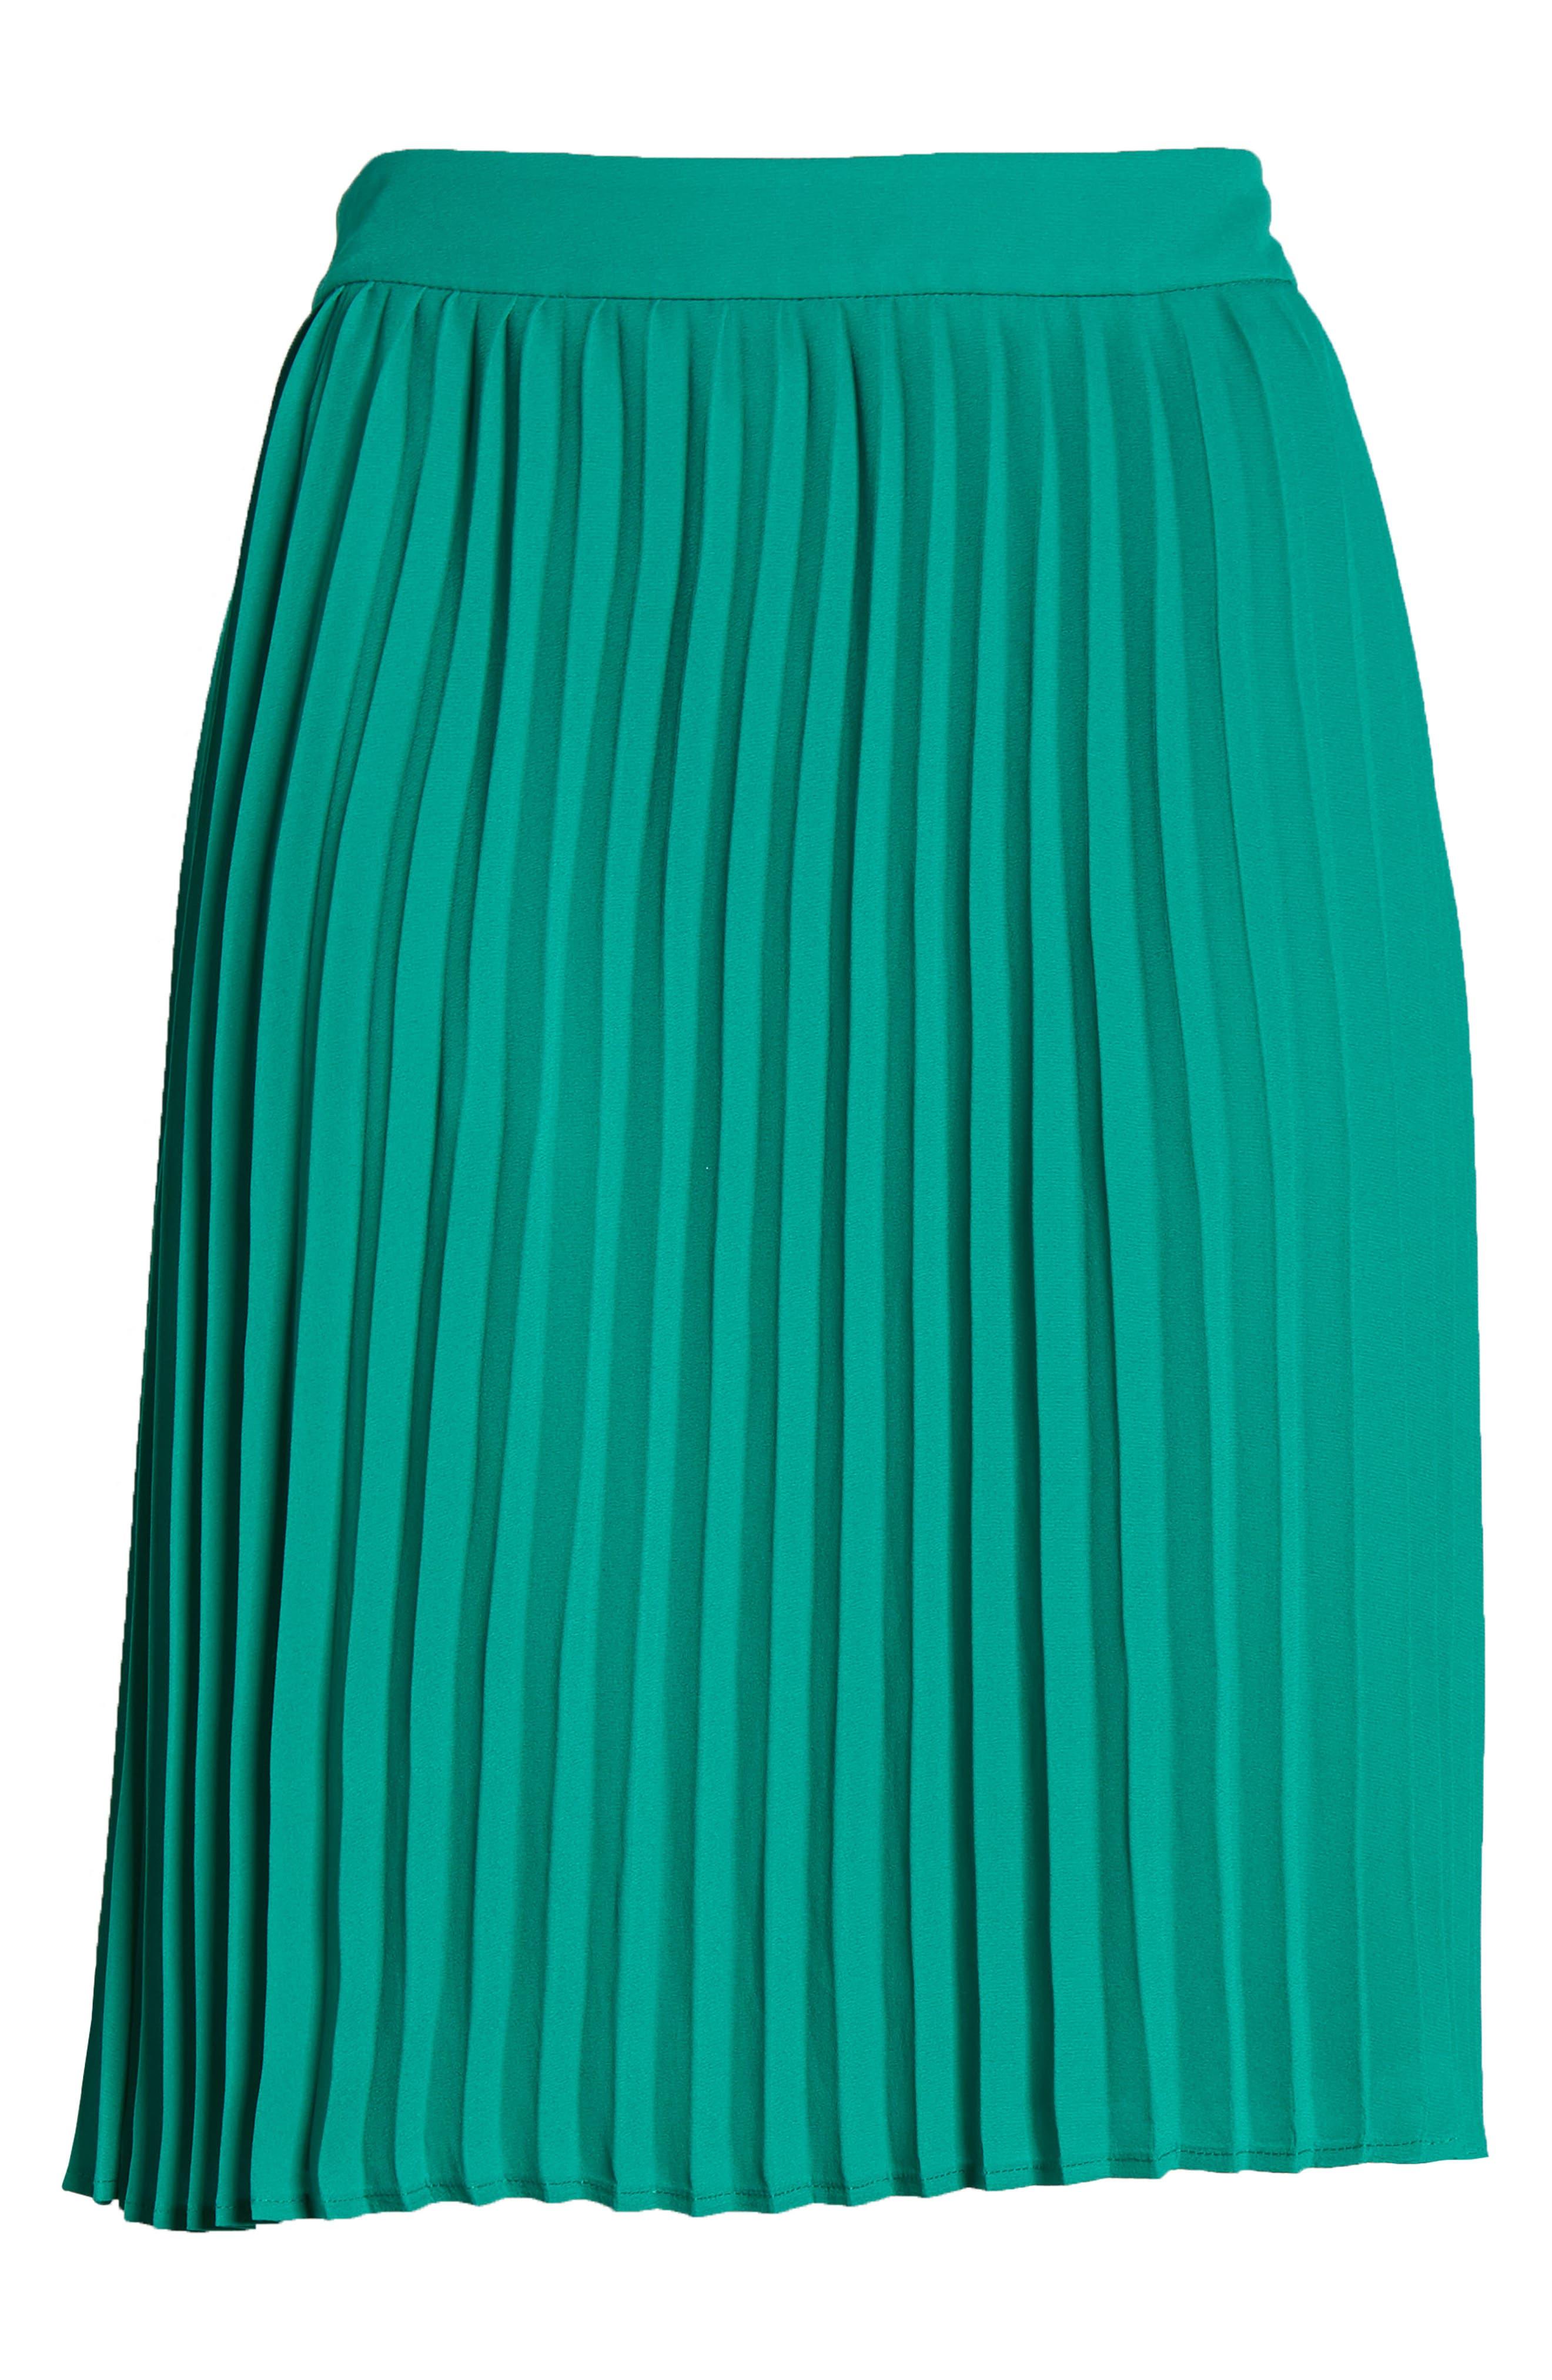 GIBSON, x International Women's Day Thamarr Pleated Skirt, Alternate thumbnail 6, color, GREEN